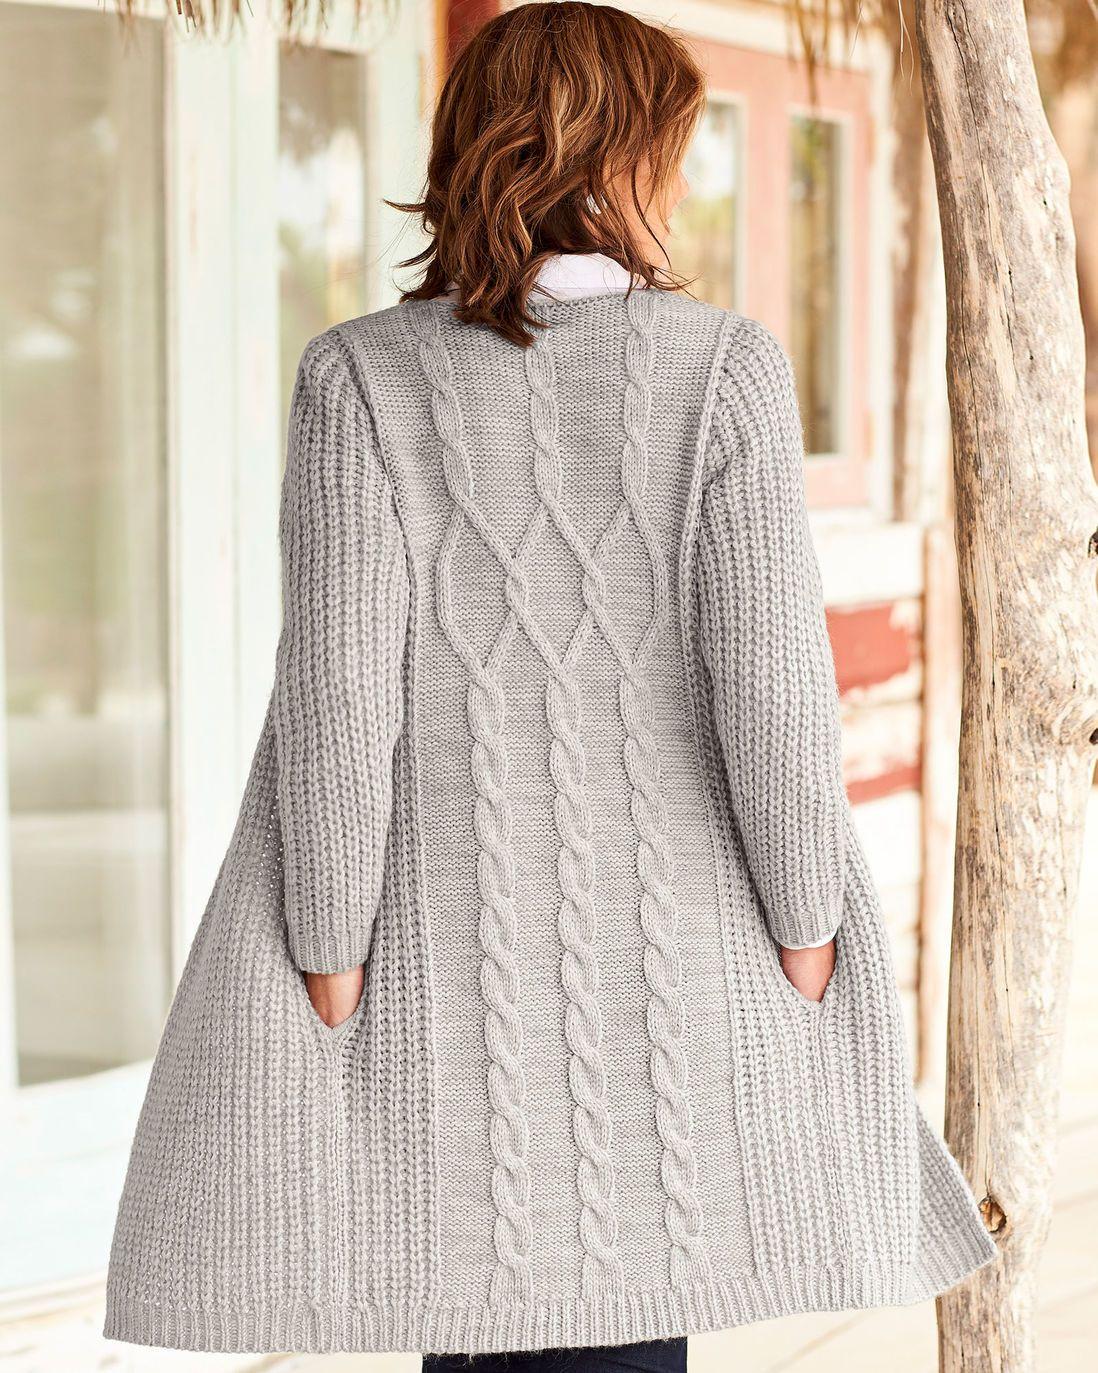 Longline Cable Cardigan | Knit cardigan pattern, Ladies ...